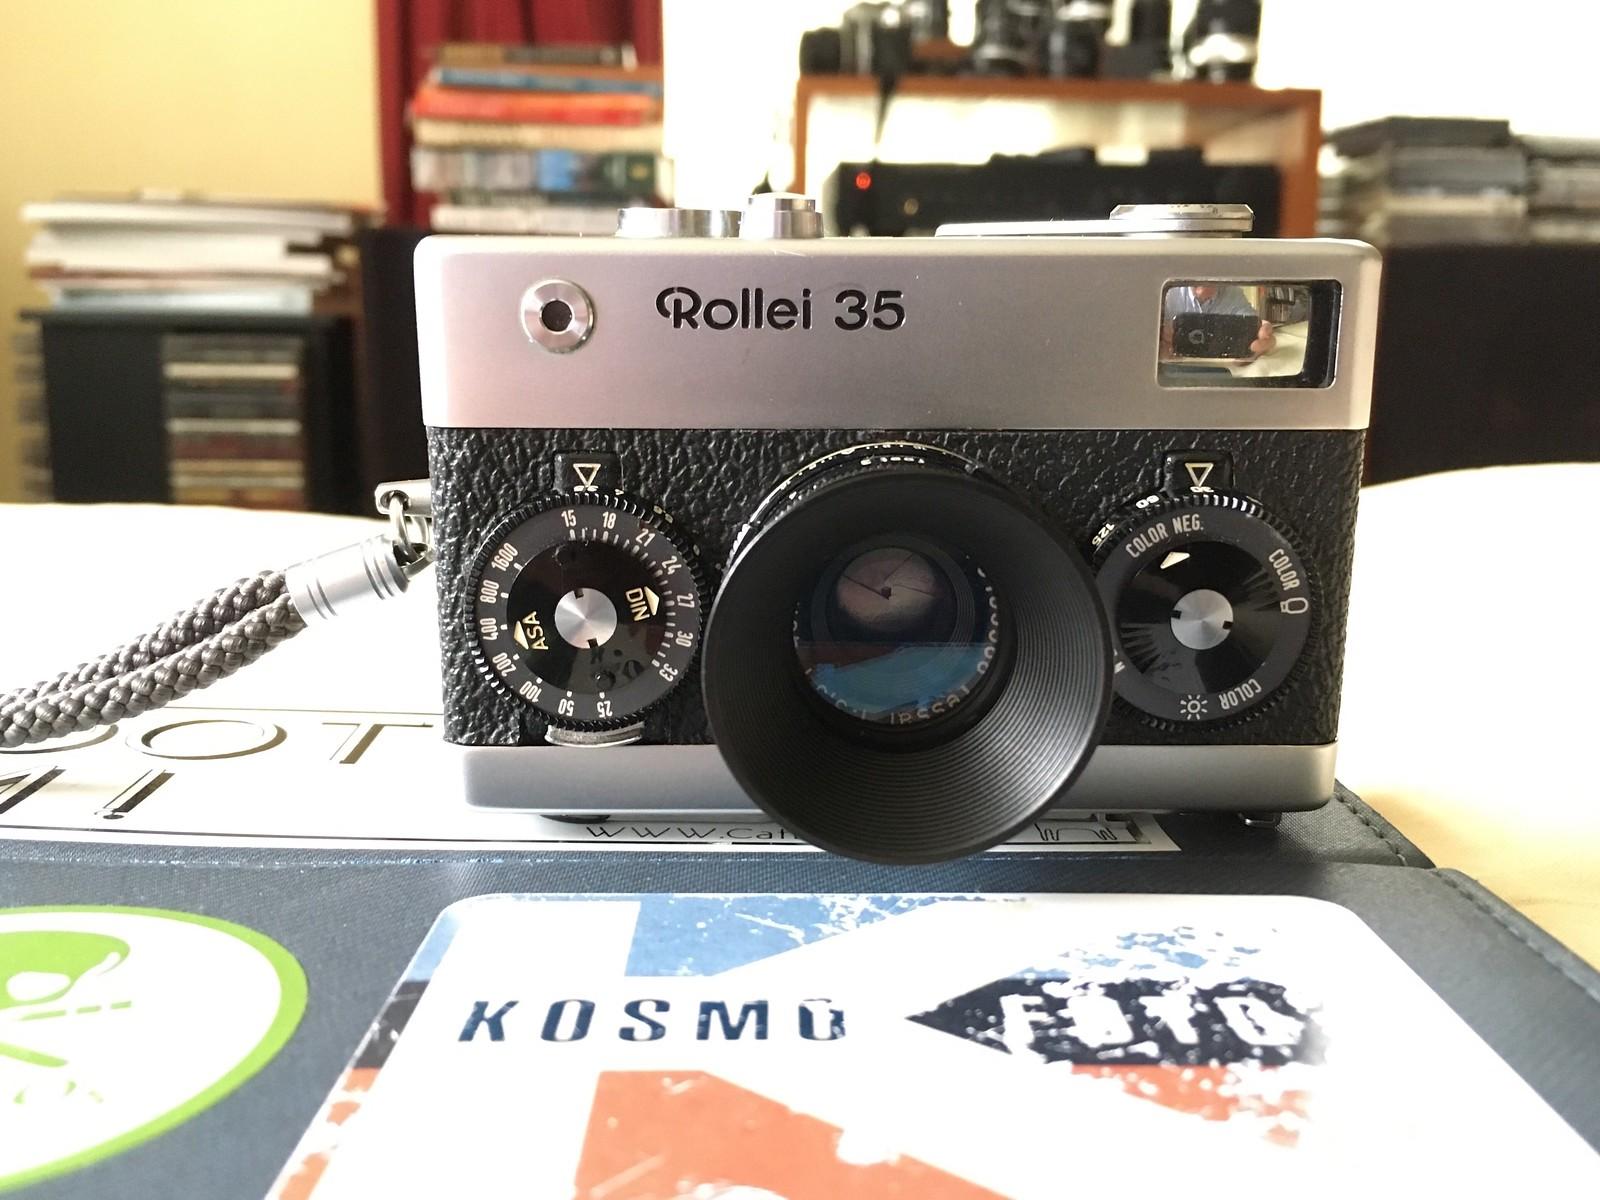 My Rollei 35.